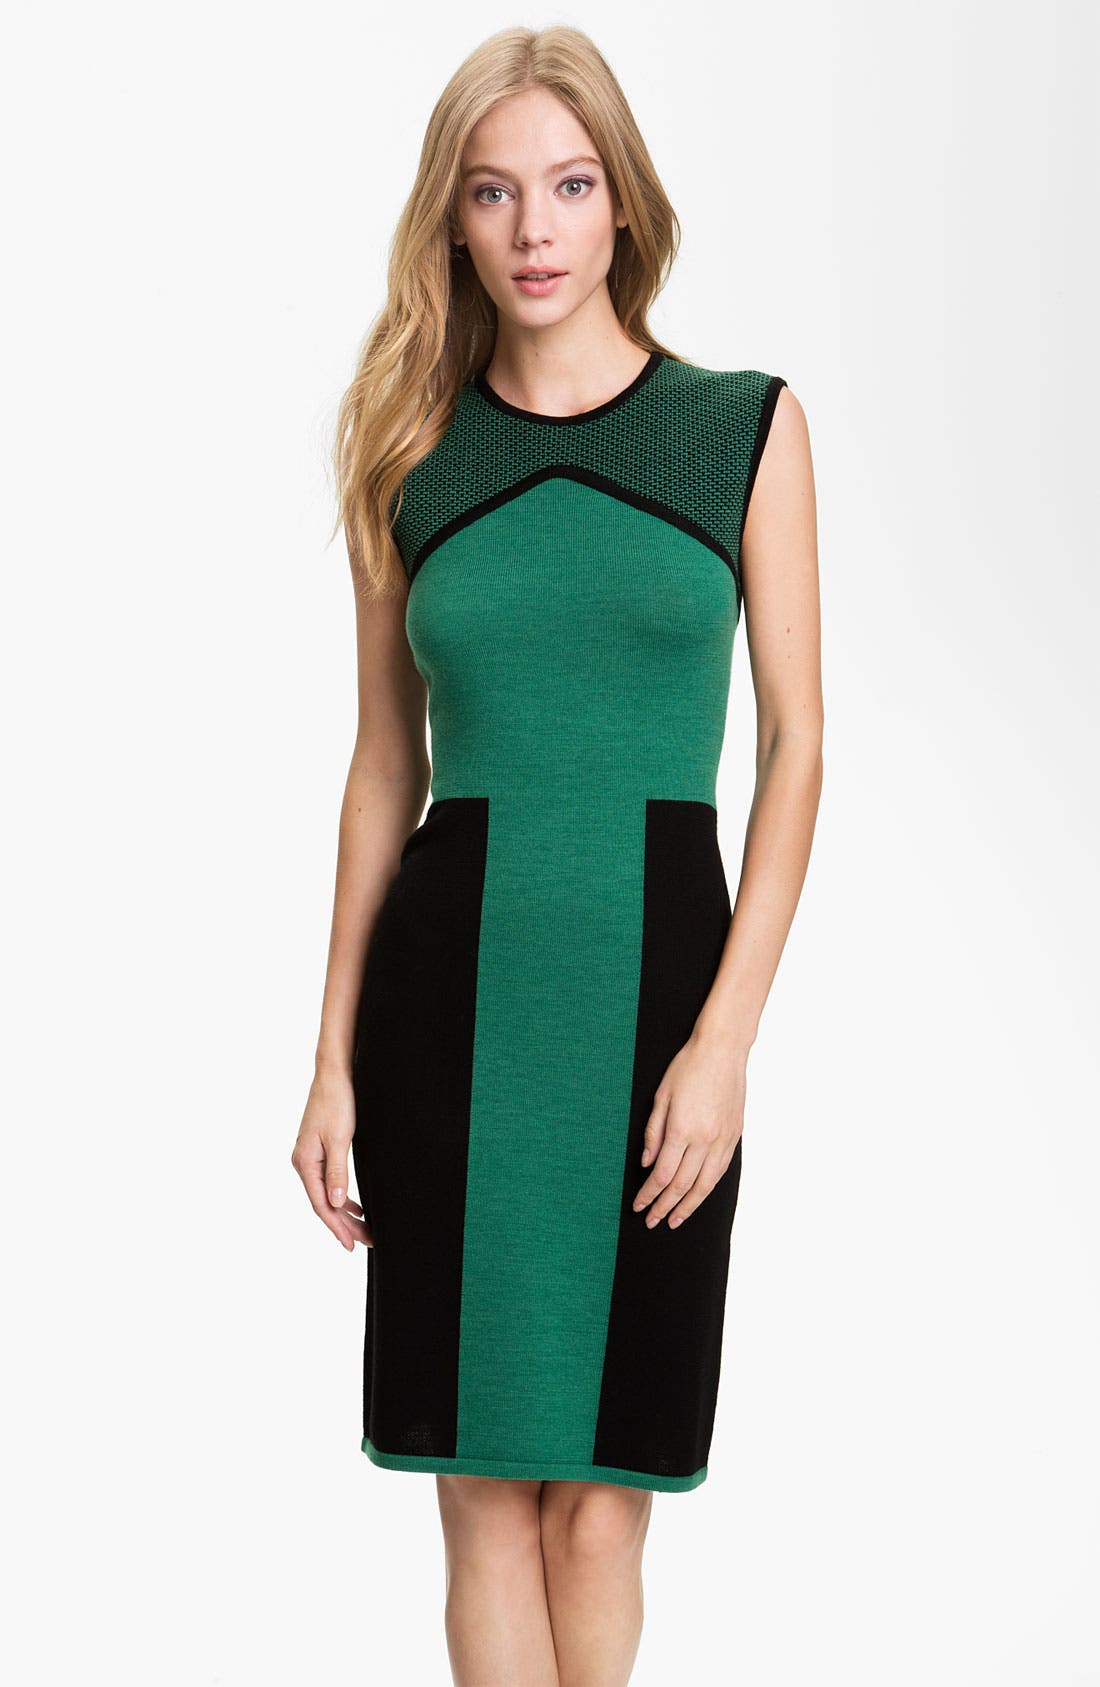 Alternate Image 1 Selected - Rachel Roy Colorblock Wool Shift Dress